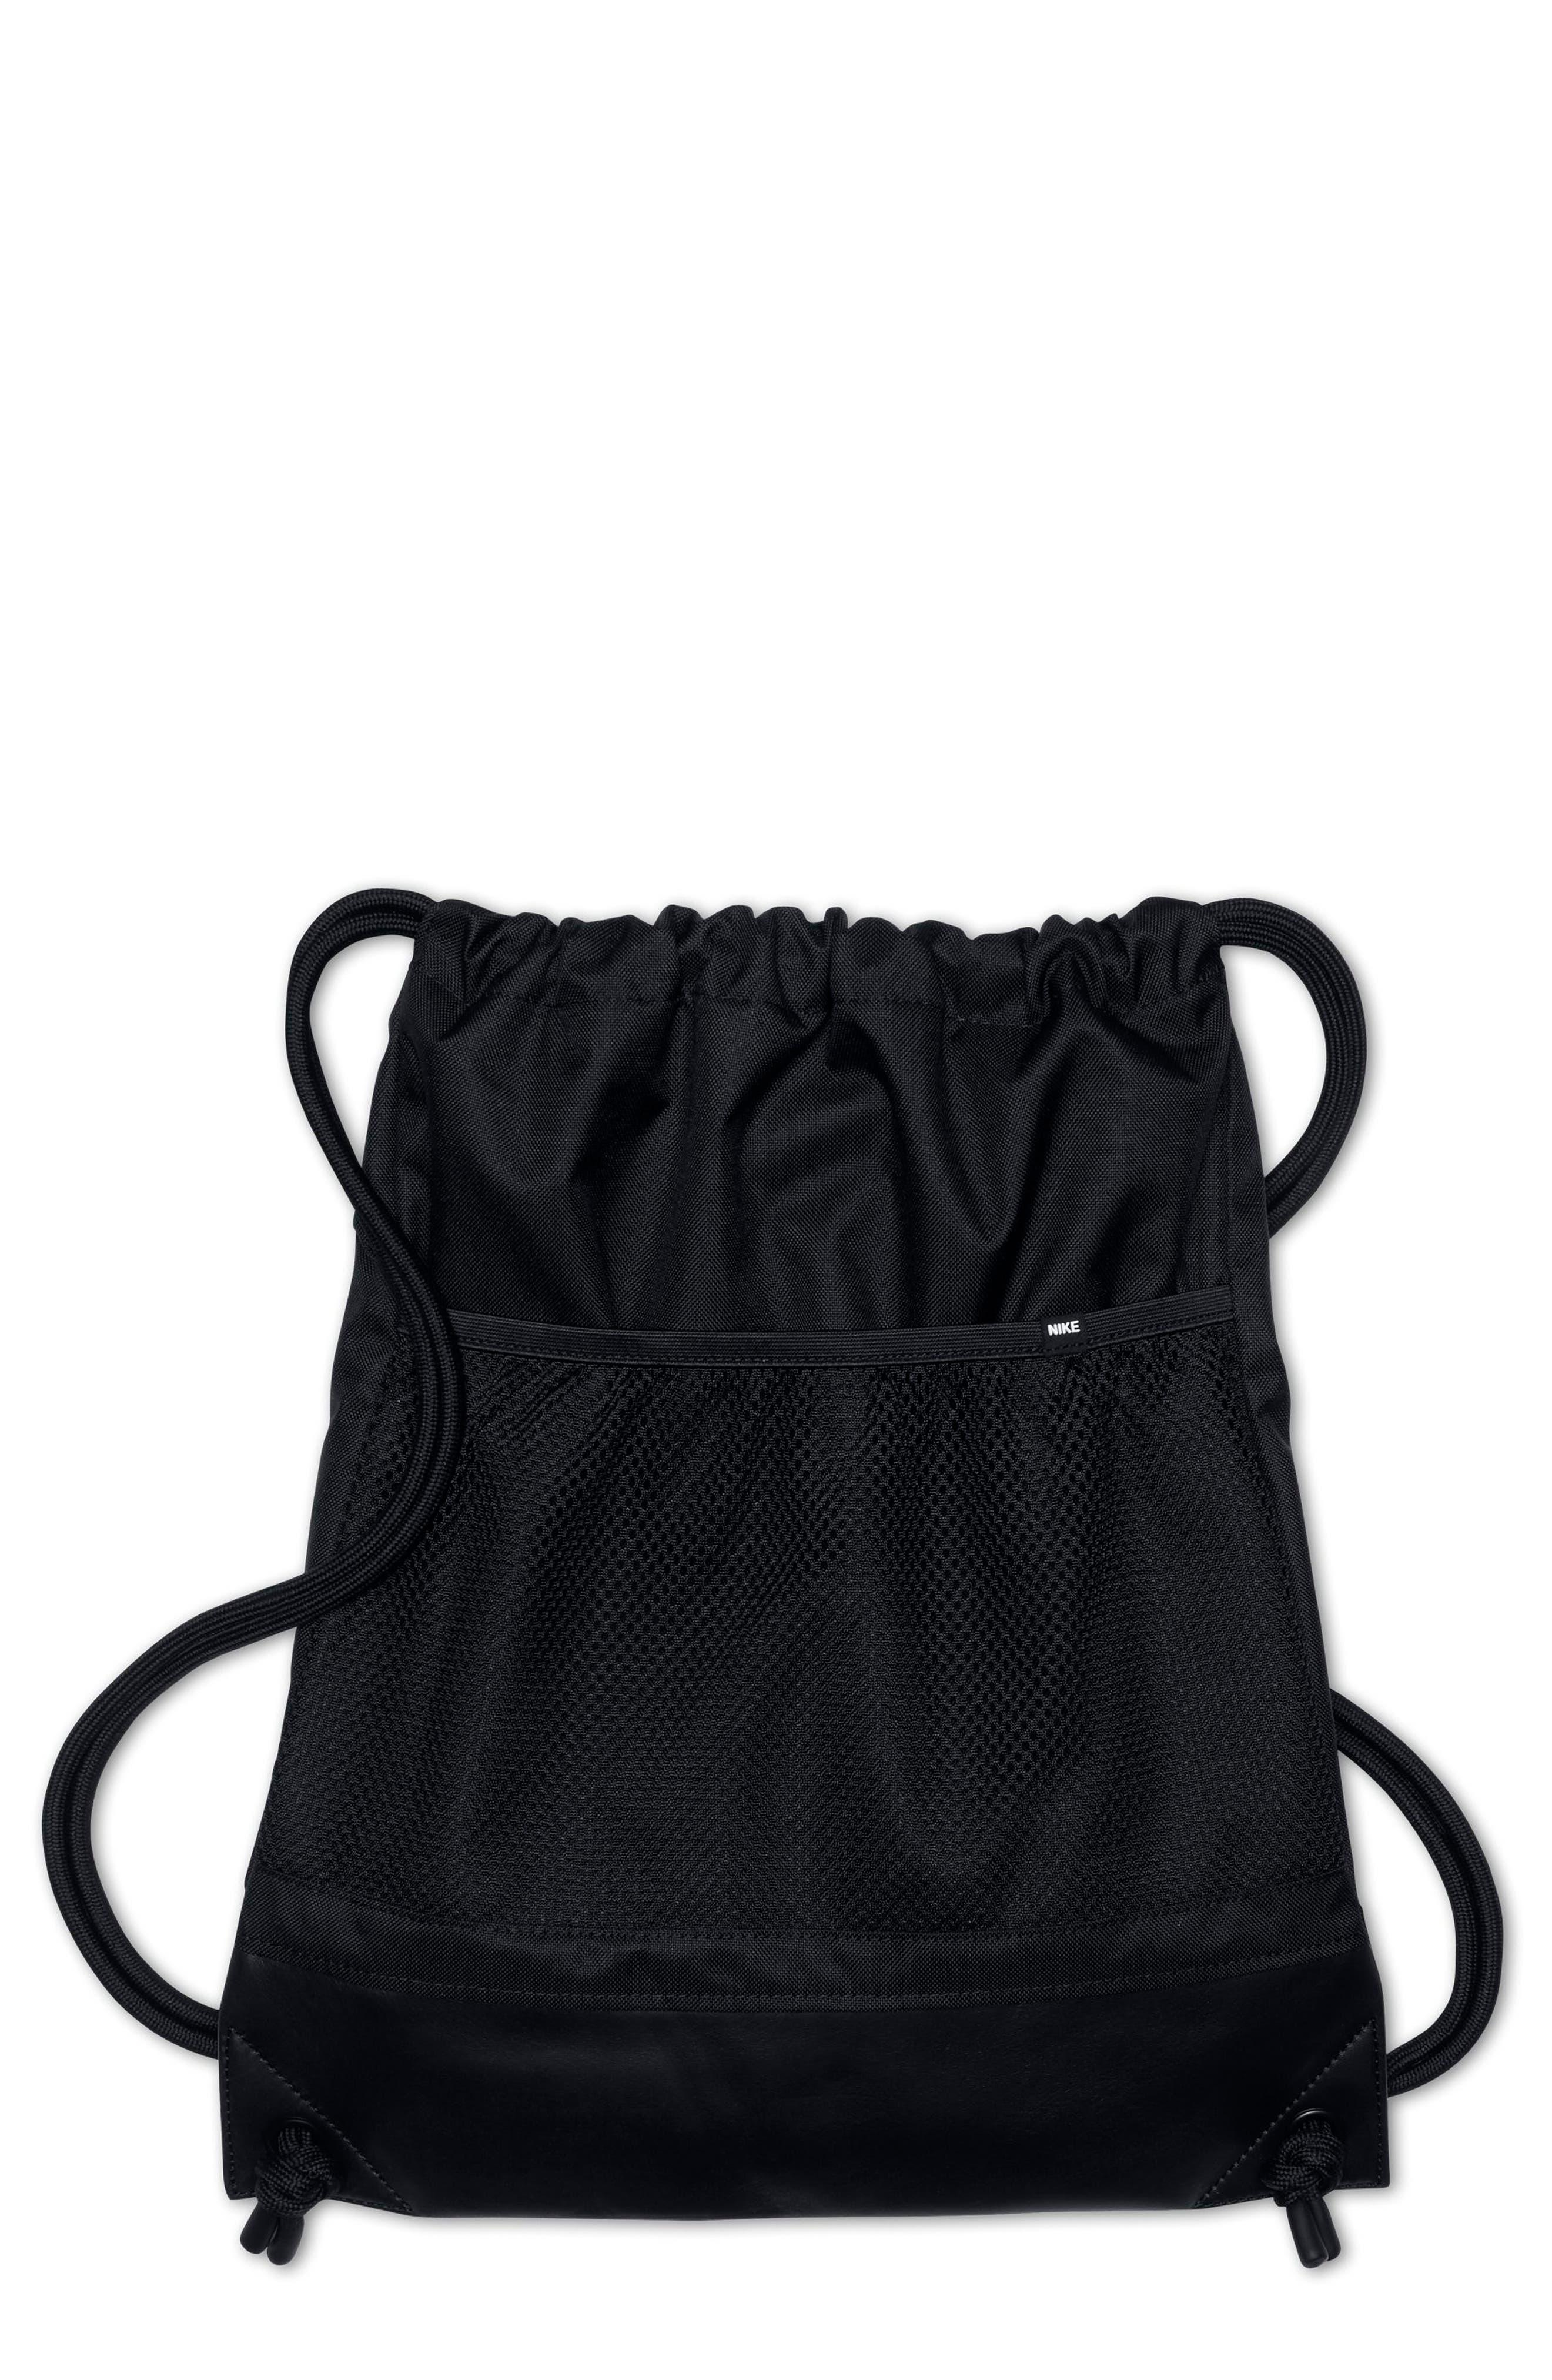 NikeLab Gym Sack,                         Main,                         color, BLACK/ BLACK/ BLACK